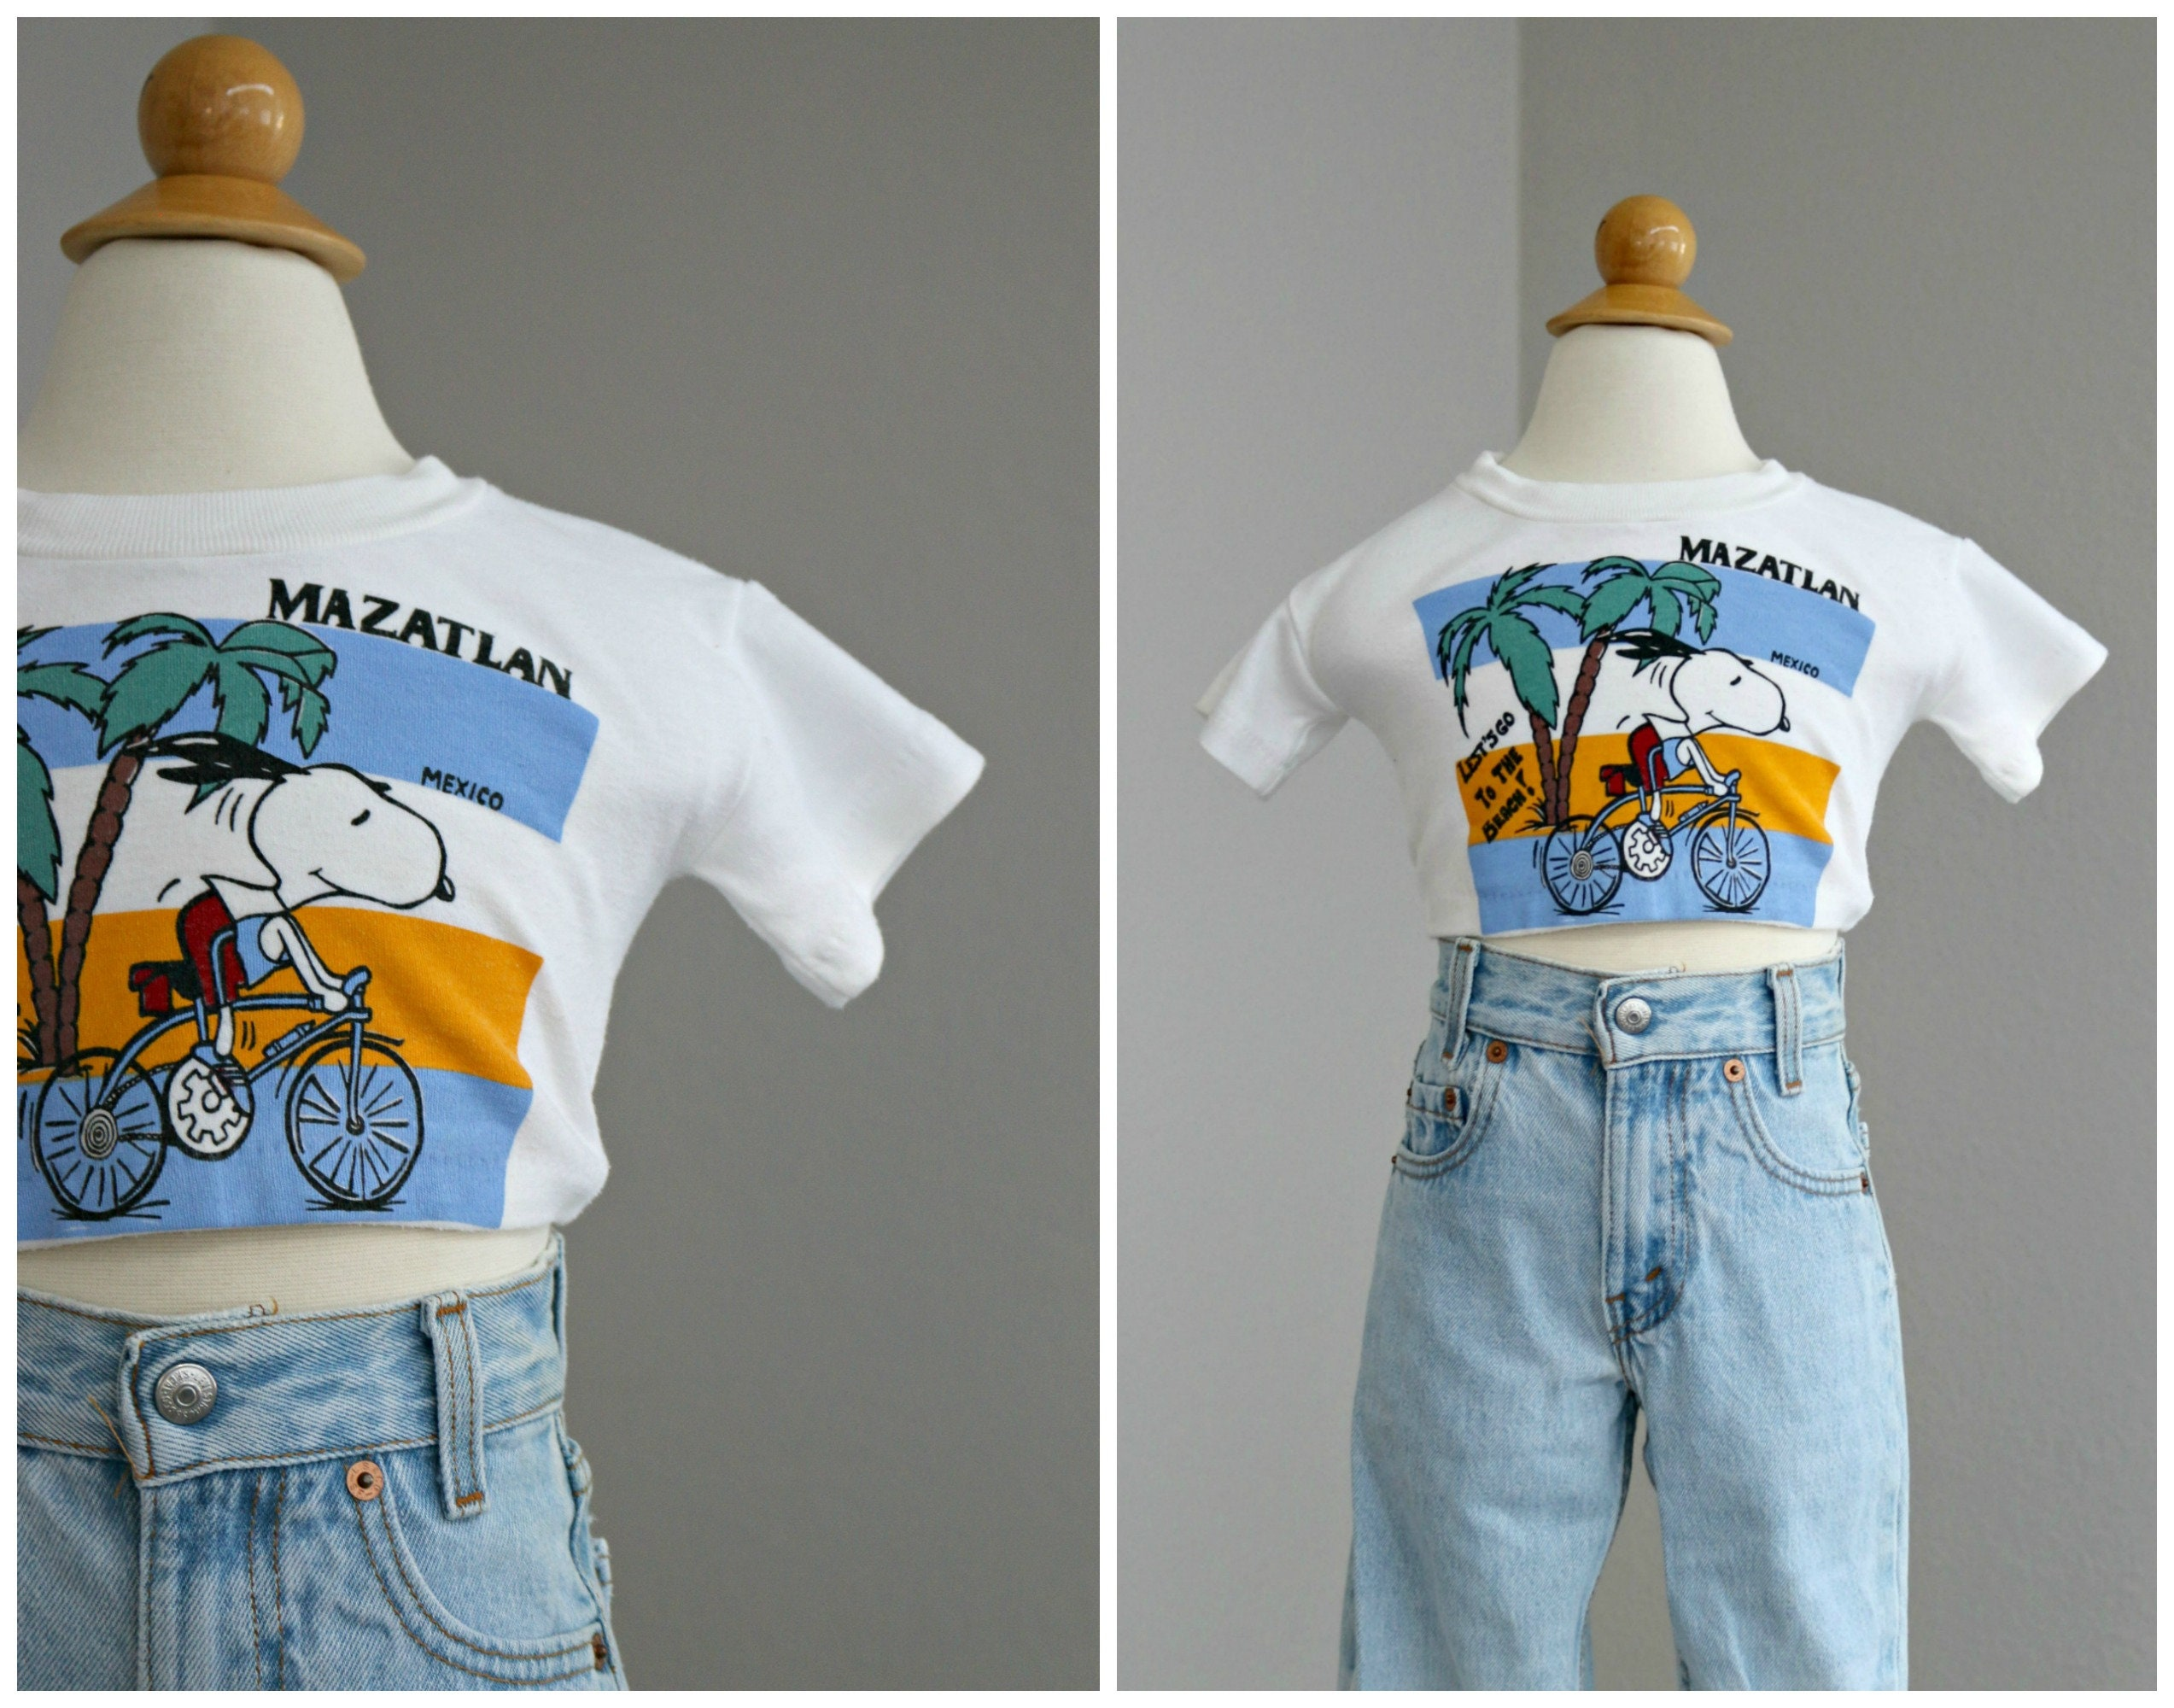 80s Tops, Shirts, T-shirts, Blouse   90s T-shirts 1980s Mazatlan Snoopy Souvenir Crop Top  Kids Size 24 Months To 2T Soft Tee T-Shirt Boy Or Girl $17.00 AT vintagedancer.com